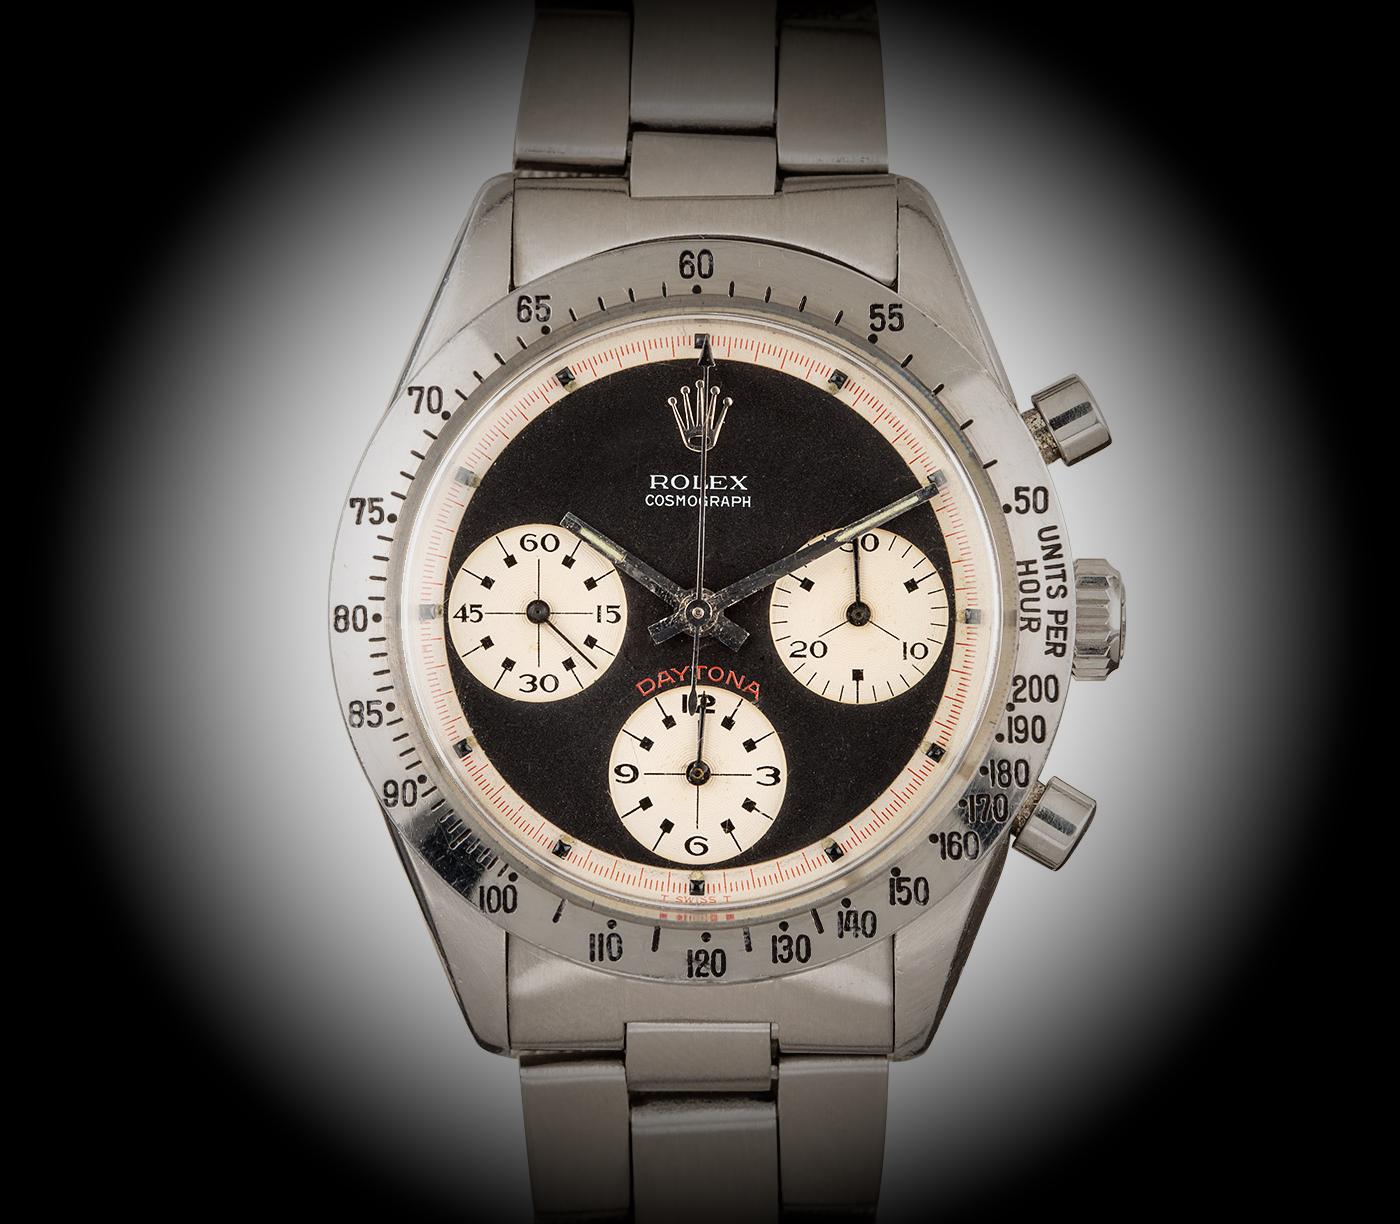 Iconic_watches_of_Hollywood_Rolex_daytona_ref._6239-_europa_star_watch_magazine_2020